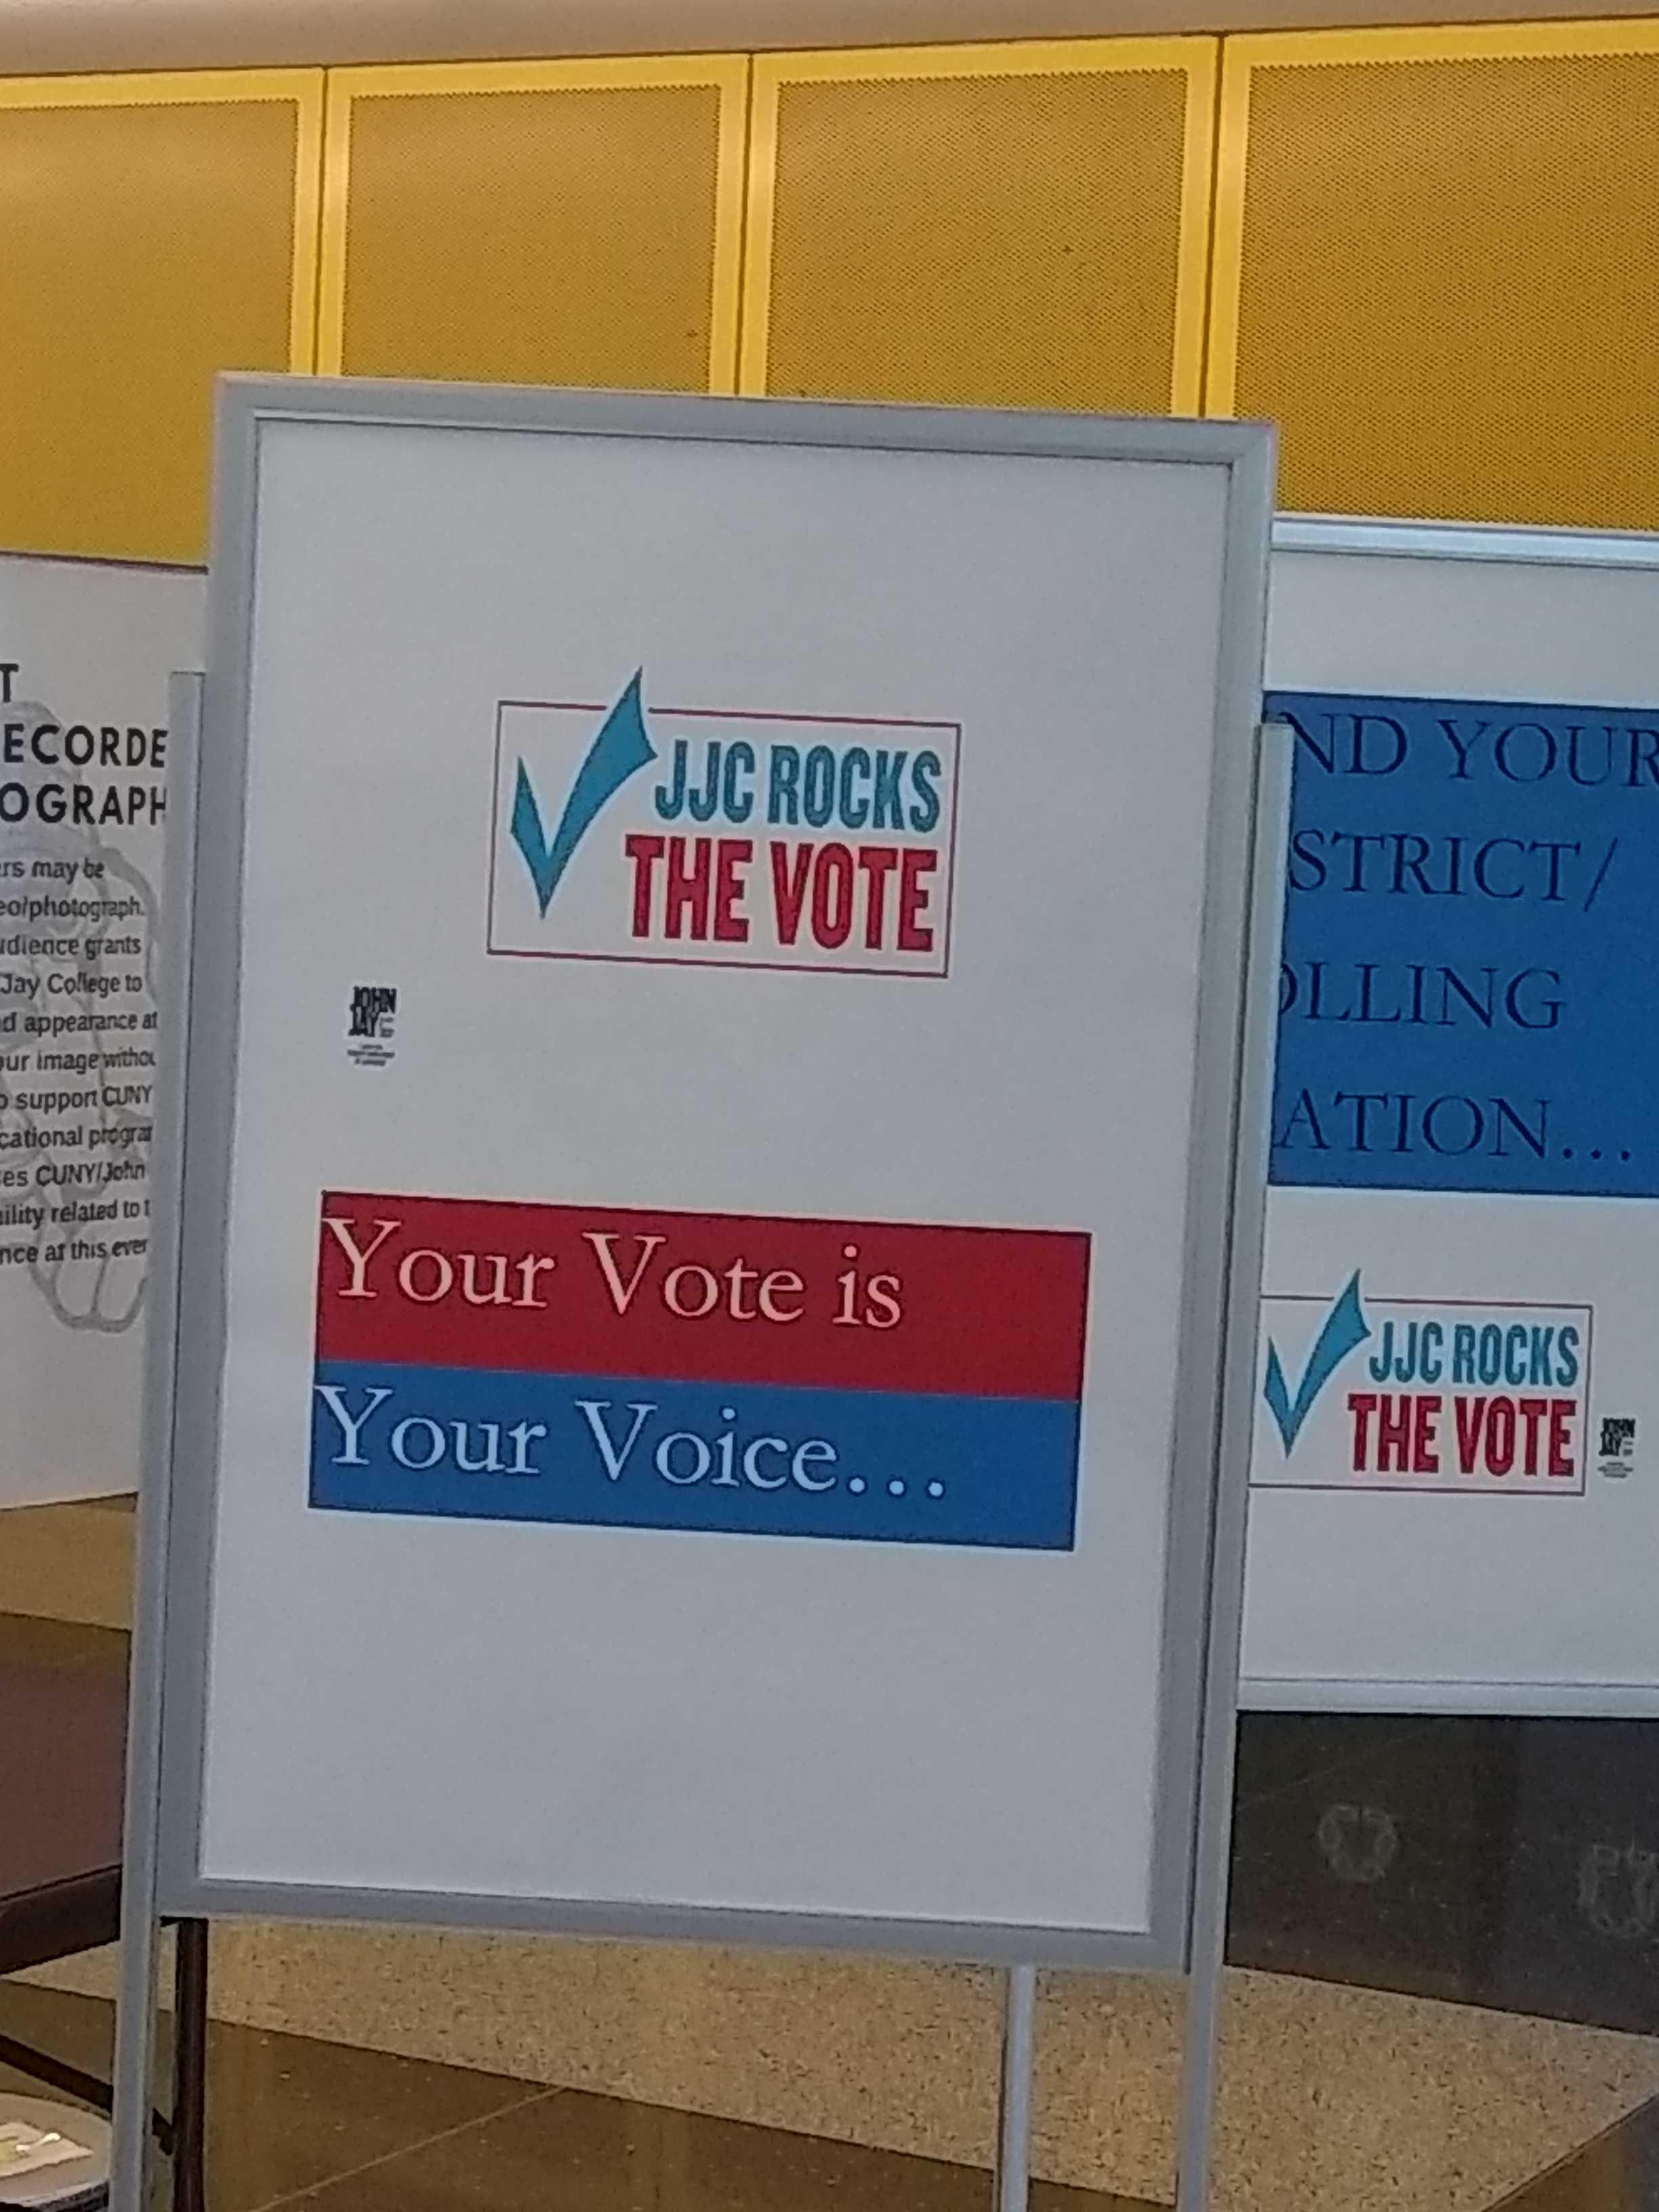 JJC Rocks The Vote Event